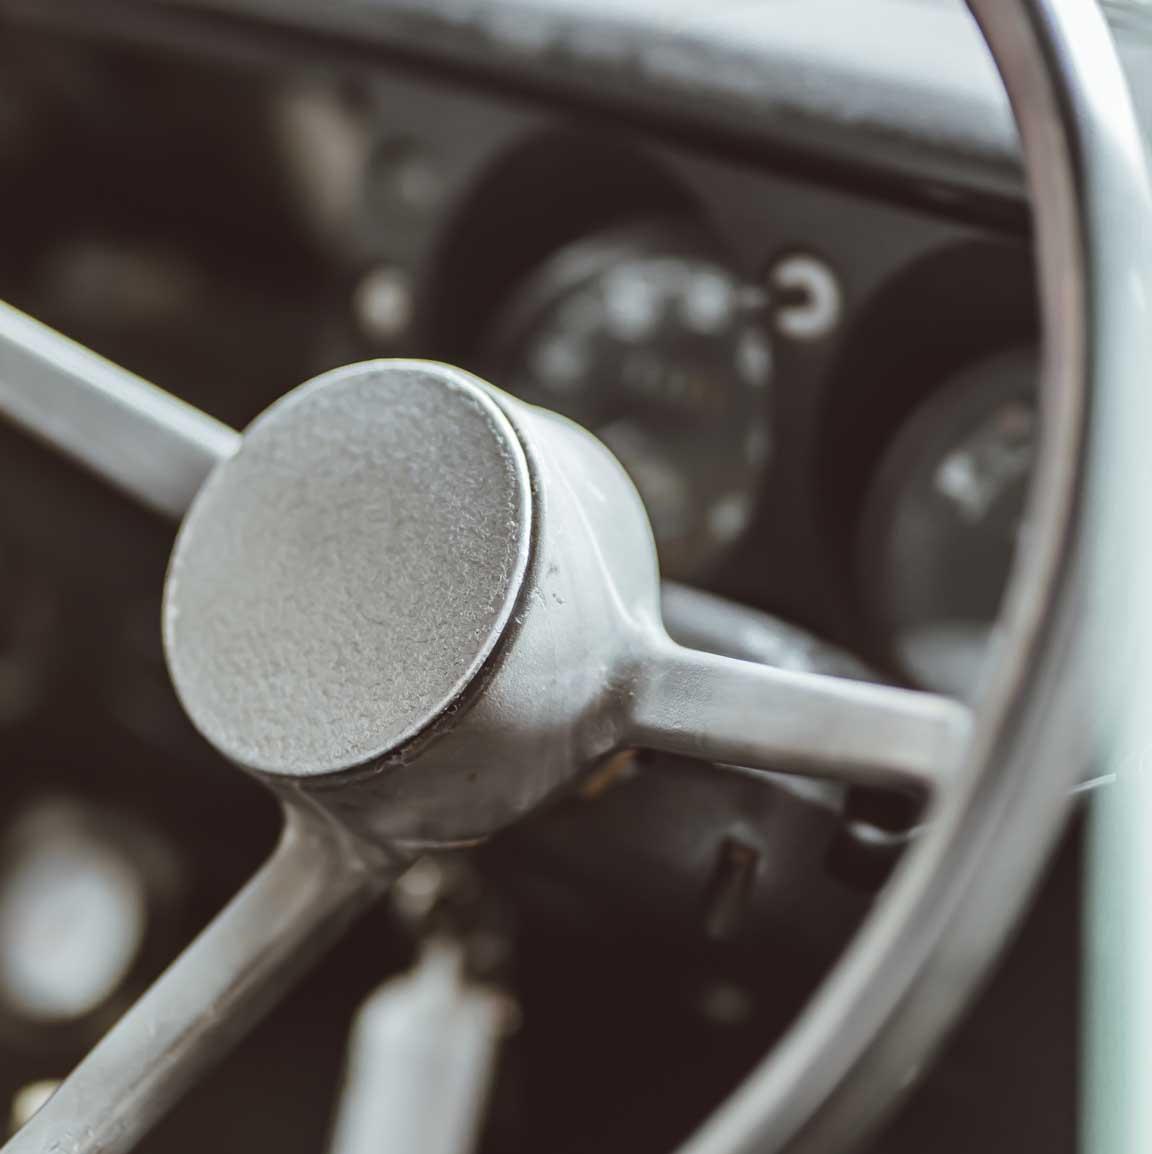 1975_Land_Rover_Series_III_109_Bahama_Gold_Small_0004_Layer 68.jpg